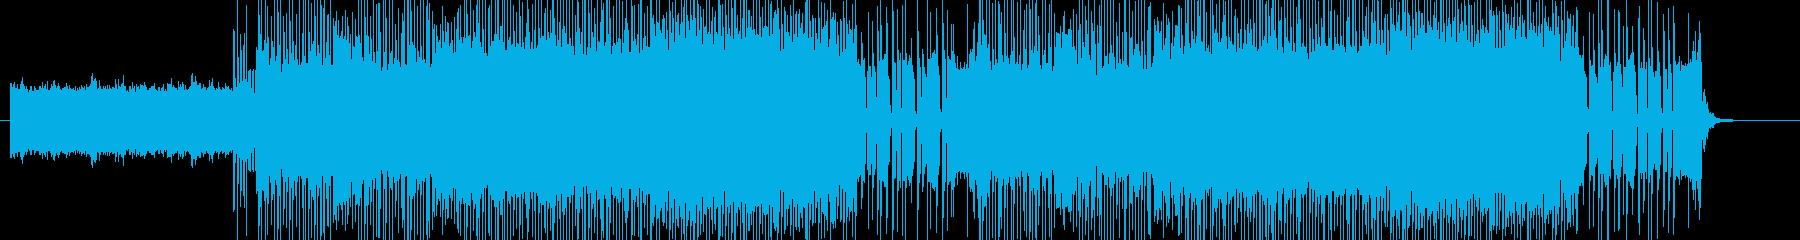 「HR/HM」「DARK系」BGM18の再生済みの波形